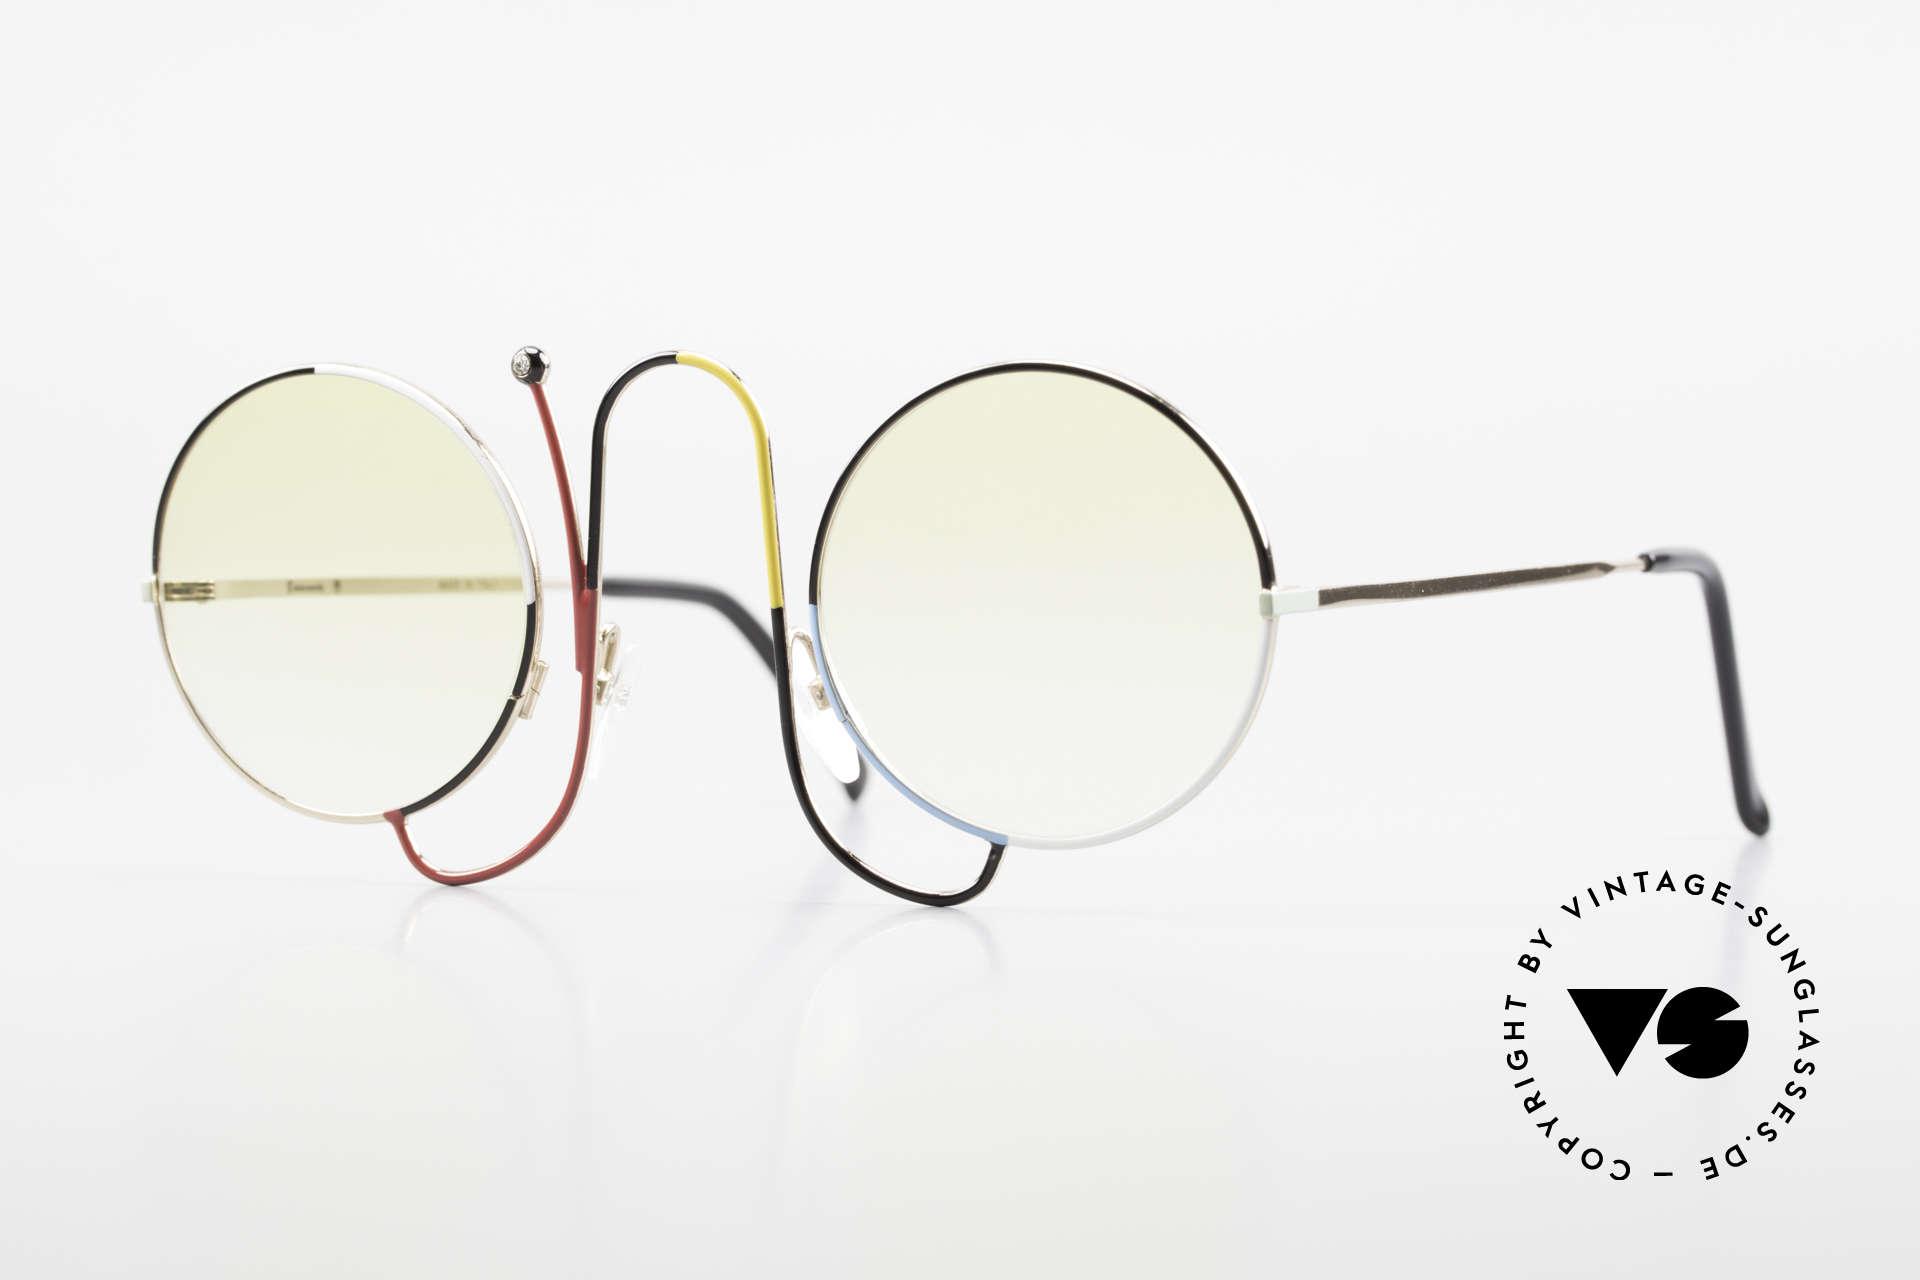 Casanova CMR 1 Rare Vintage Art Sunglasses, glamorous Casanova sunglasses from around 1985, Made for Women